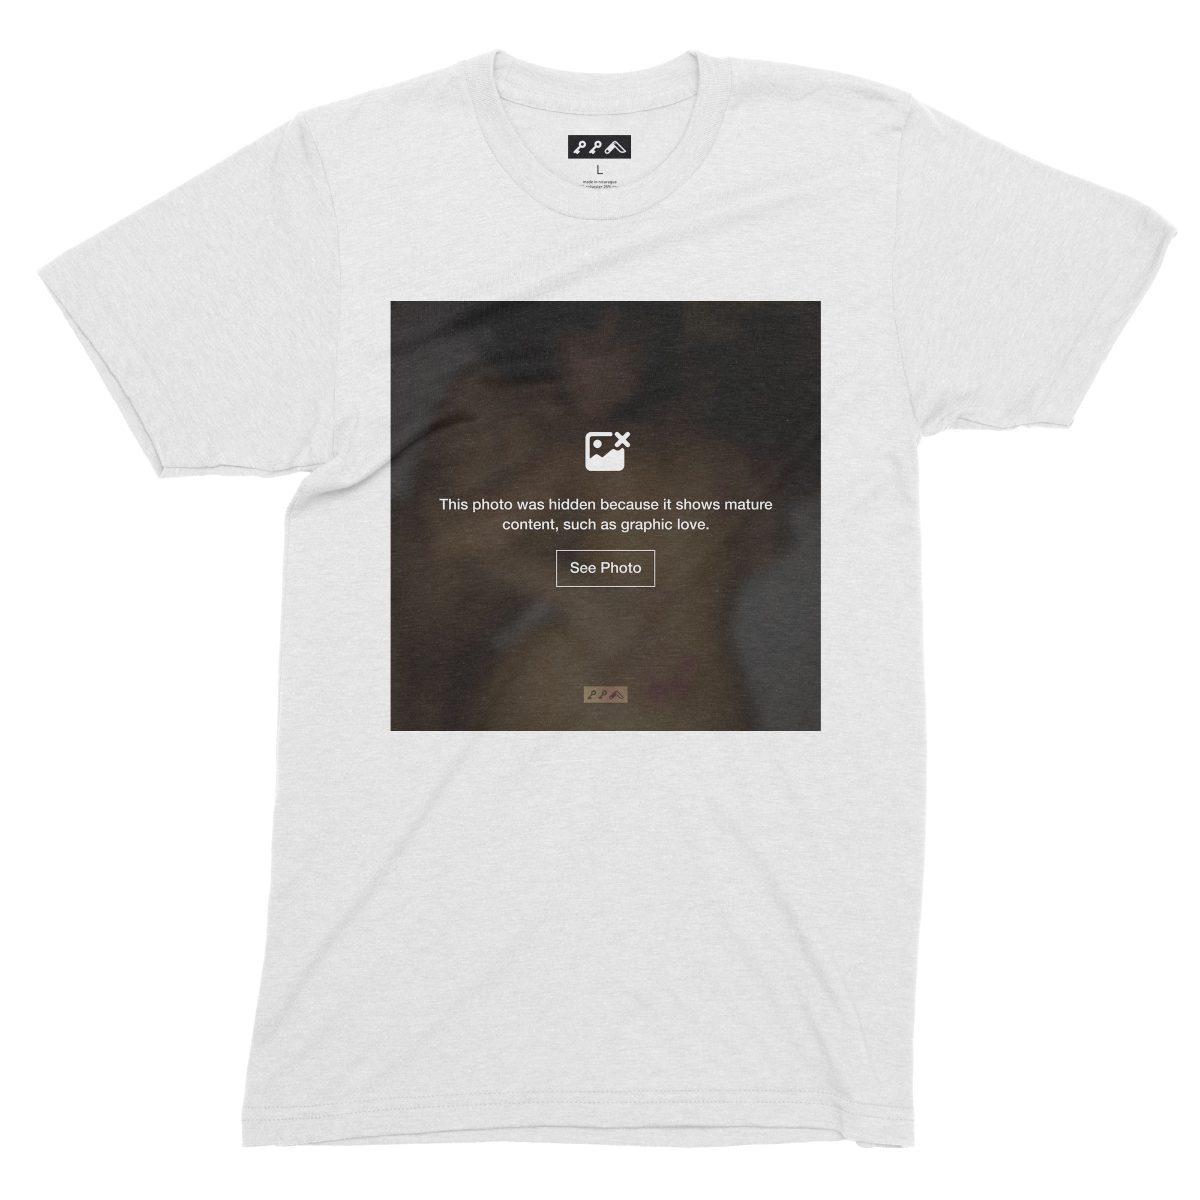 """GRAPHIC LOVE"" hidden sex image t-shirts in white by kikicutt"